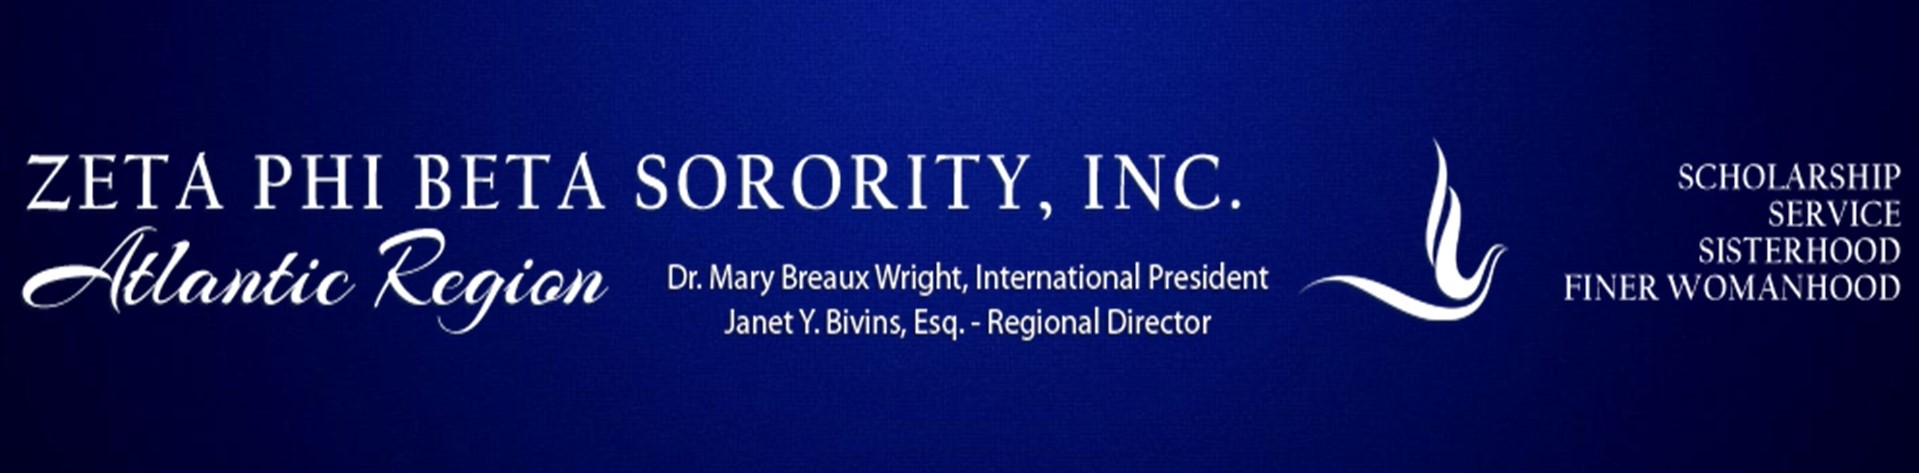 atlantic region banner (2).jpg